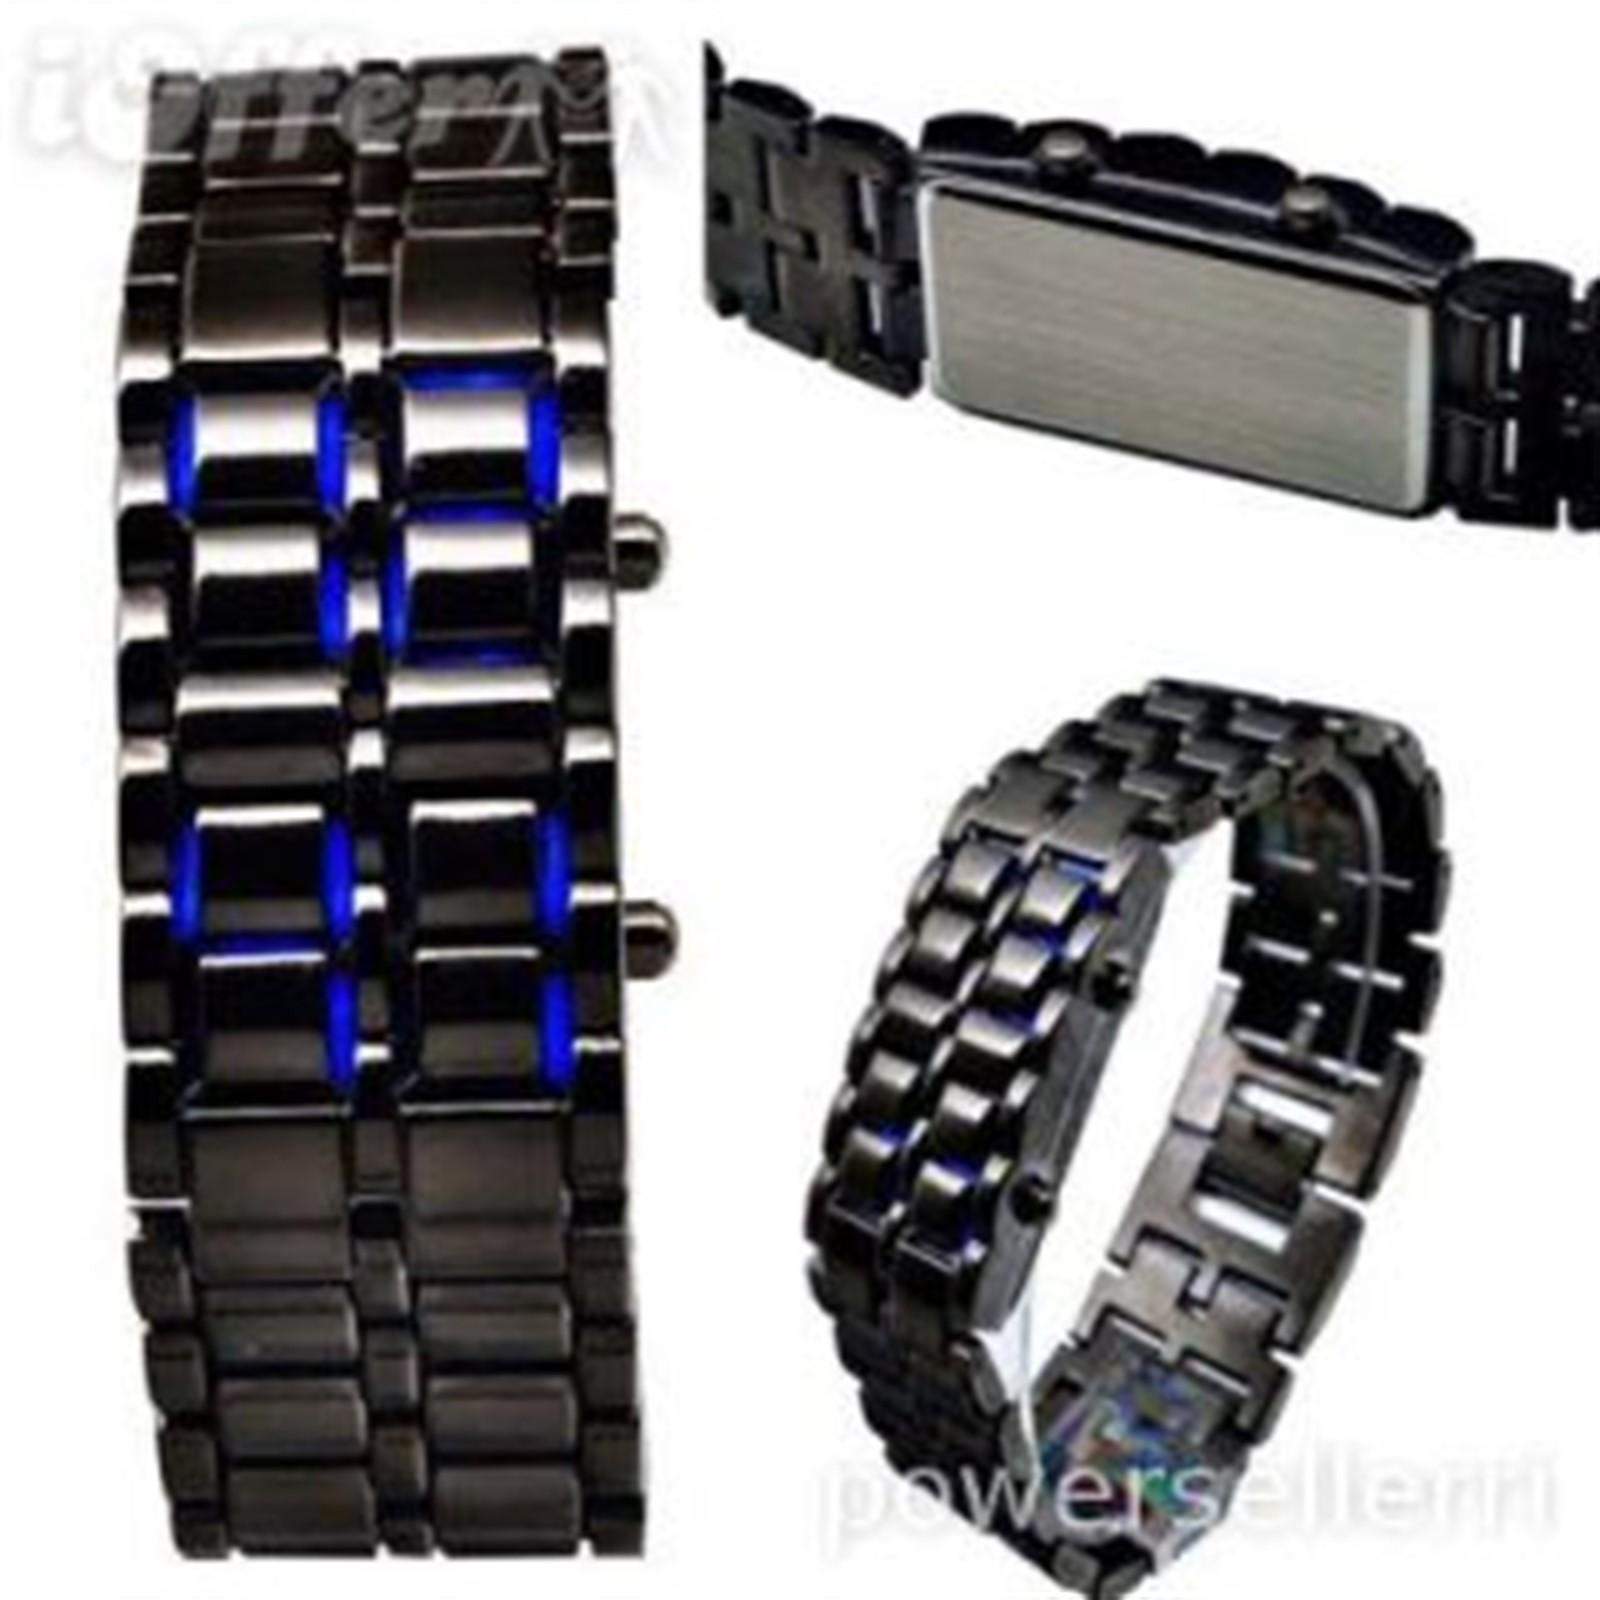 Bracelet Metal LED Watch - Designer Trendy Watch by miss A